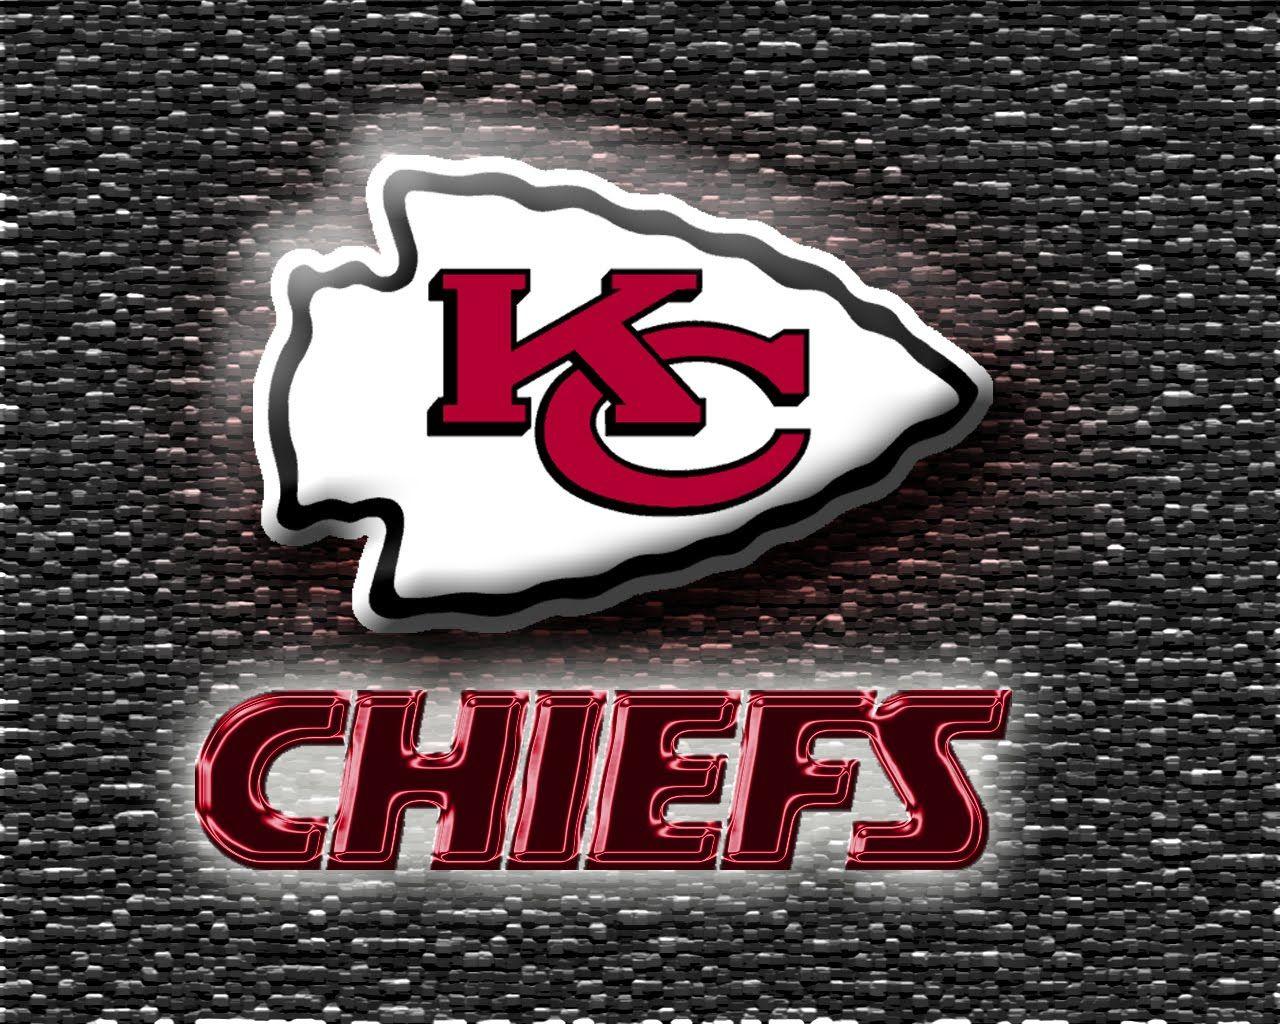 Free Wallpaper Stock Kc Chiefs Wallpaper Chiefs Wallpaper Kansas City Chiefs Kc Chiefs Football